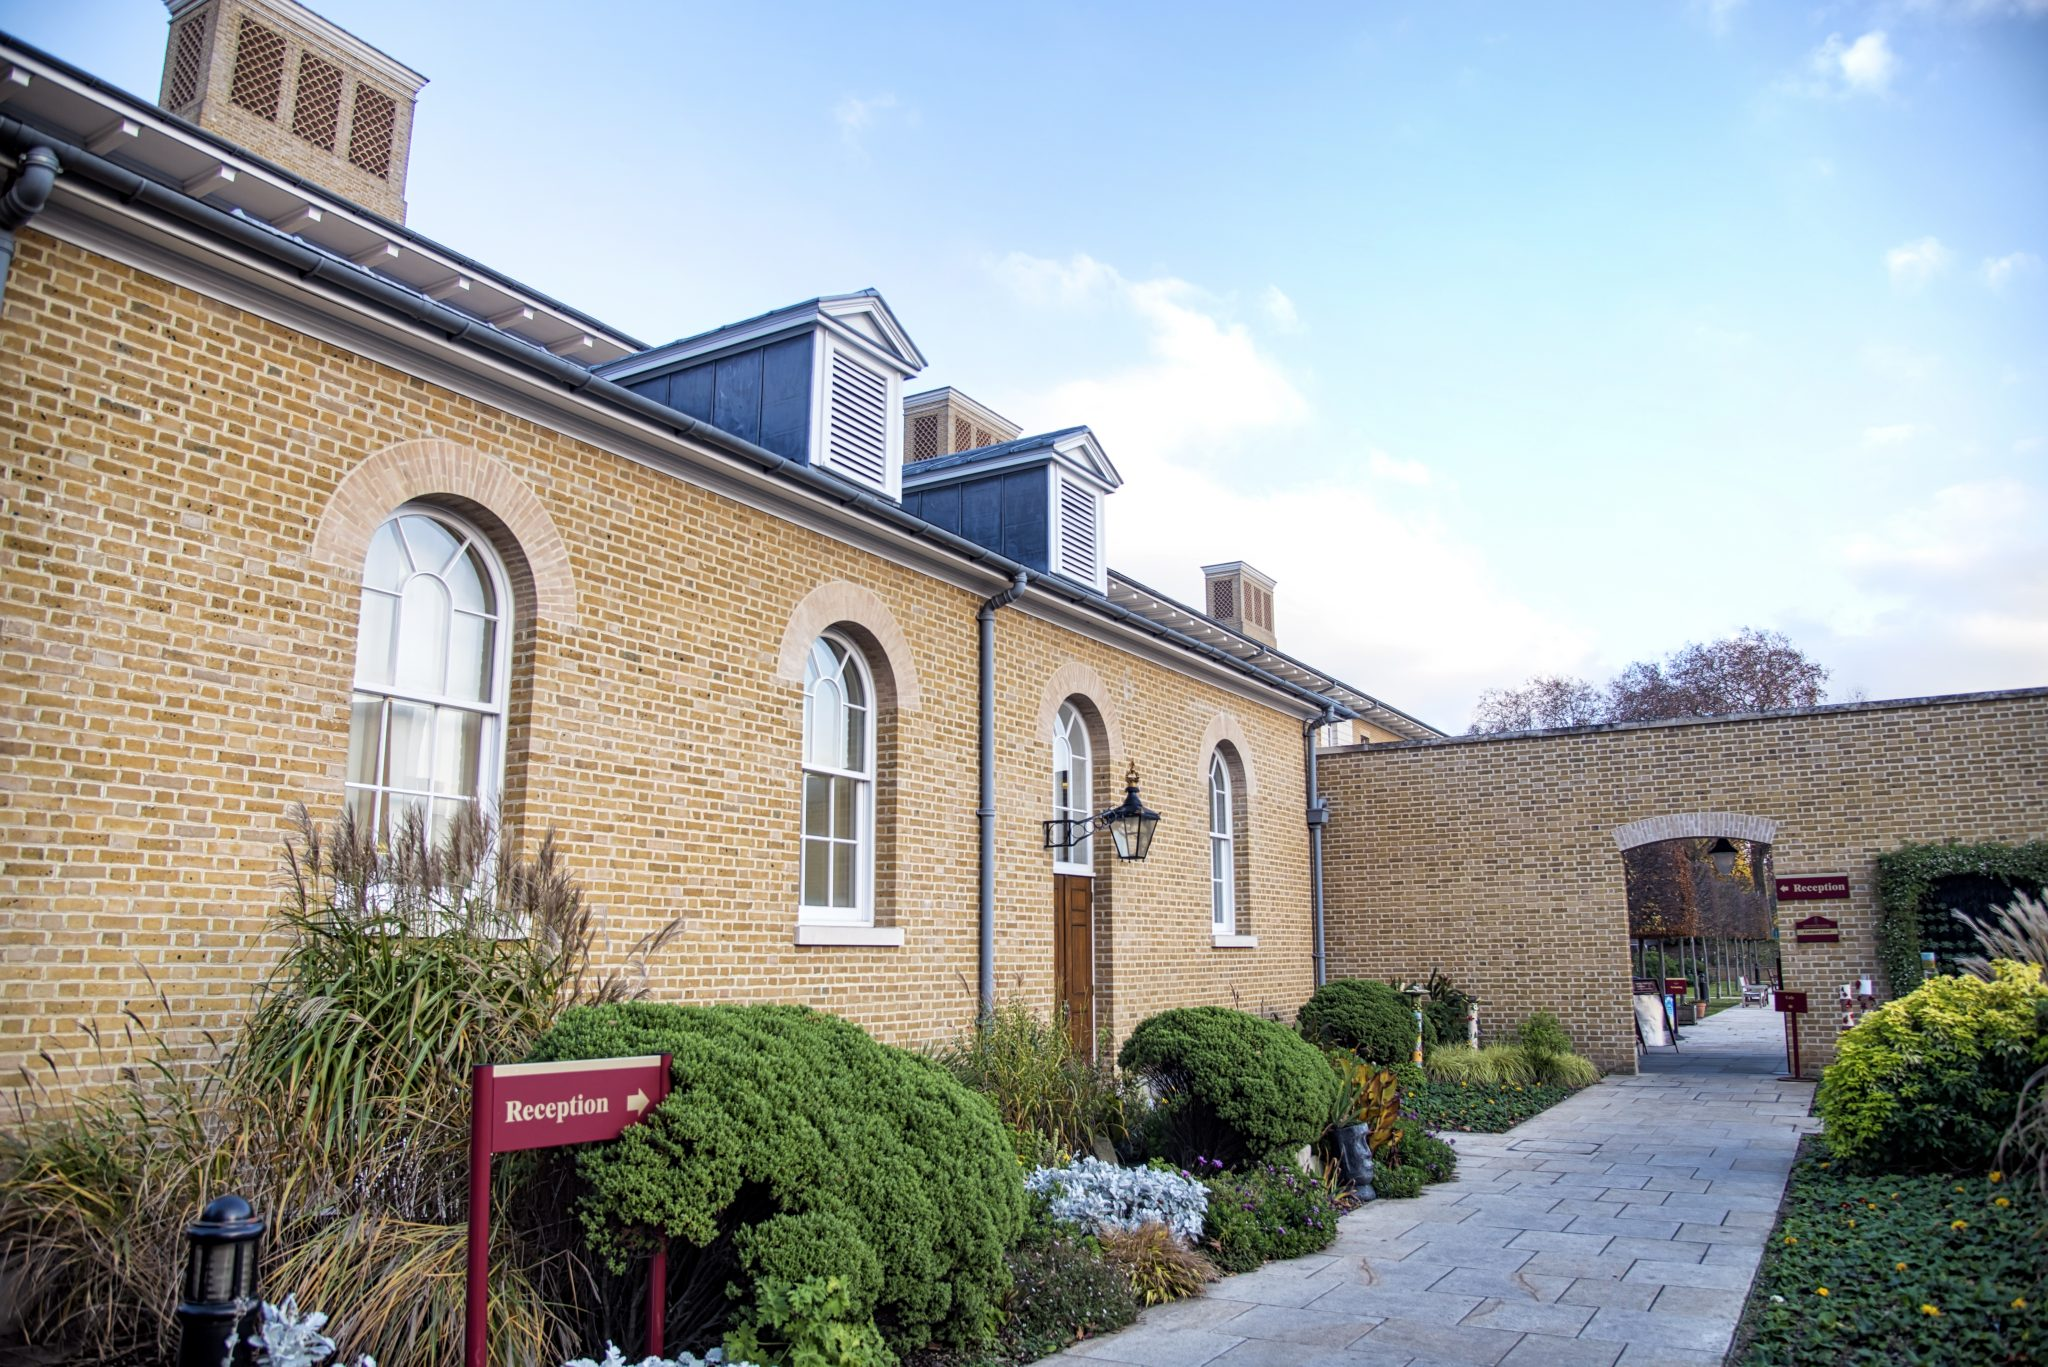 royal hospital chelsea physio clinic entrance